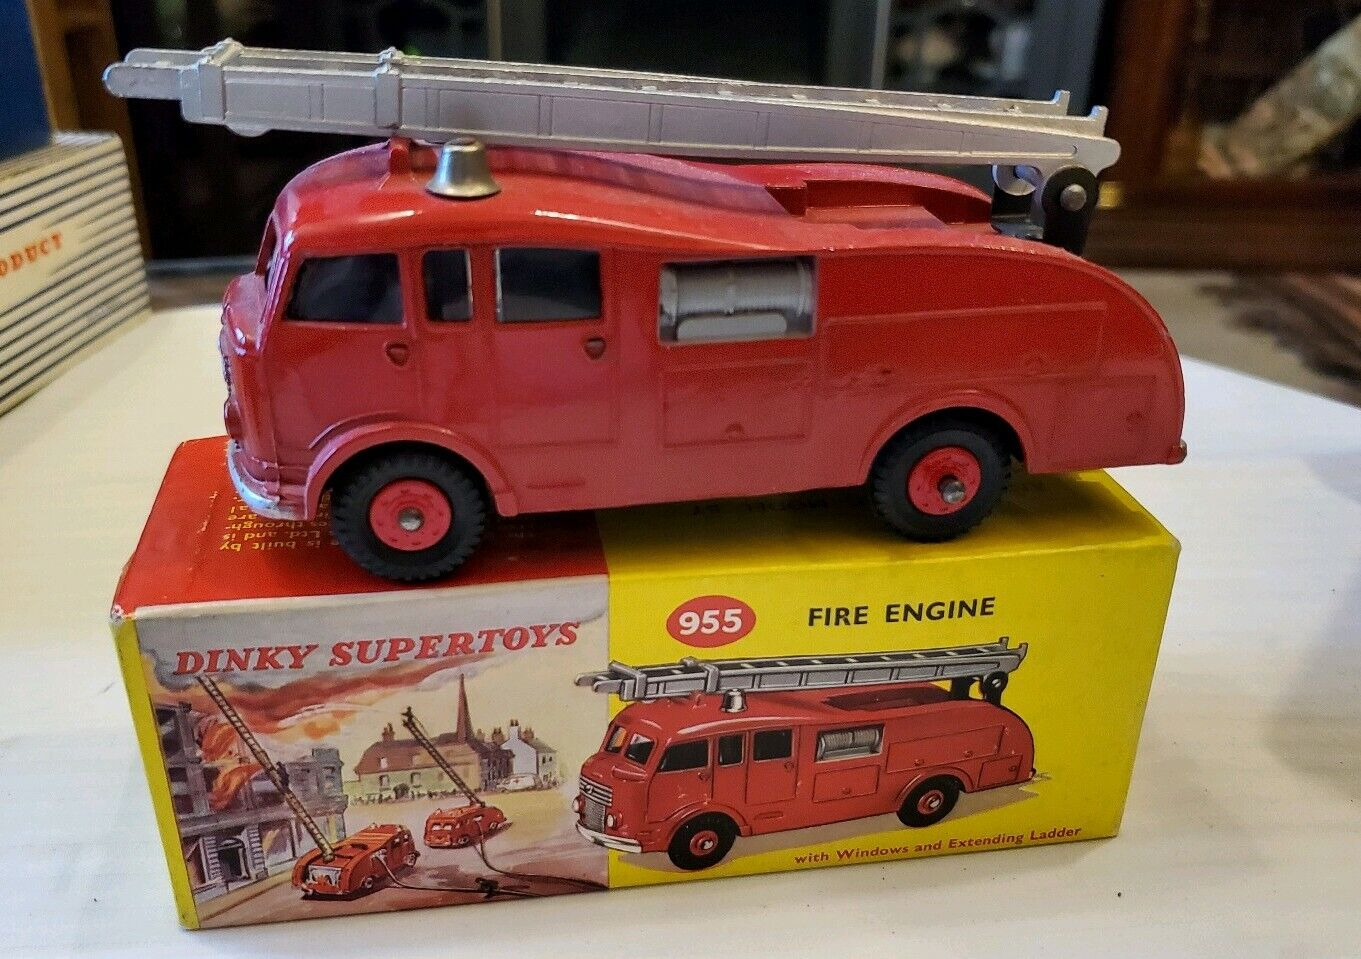 DINKY SUPERTOYS FIRE ENGINE 955 EXTENDING LADDER, WINDOWS, TOP OF BOX. ENGLAND